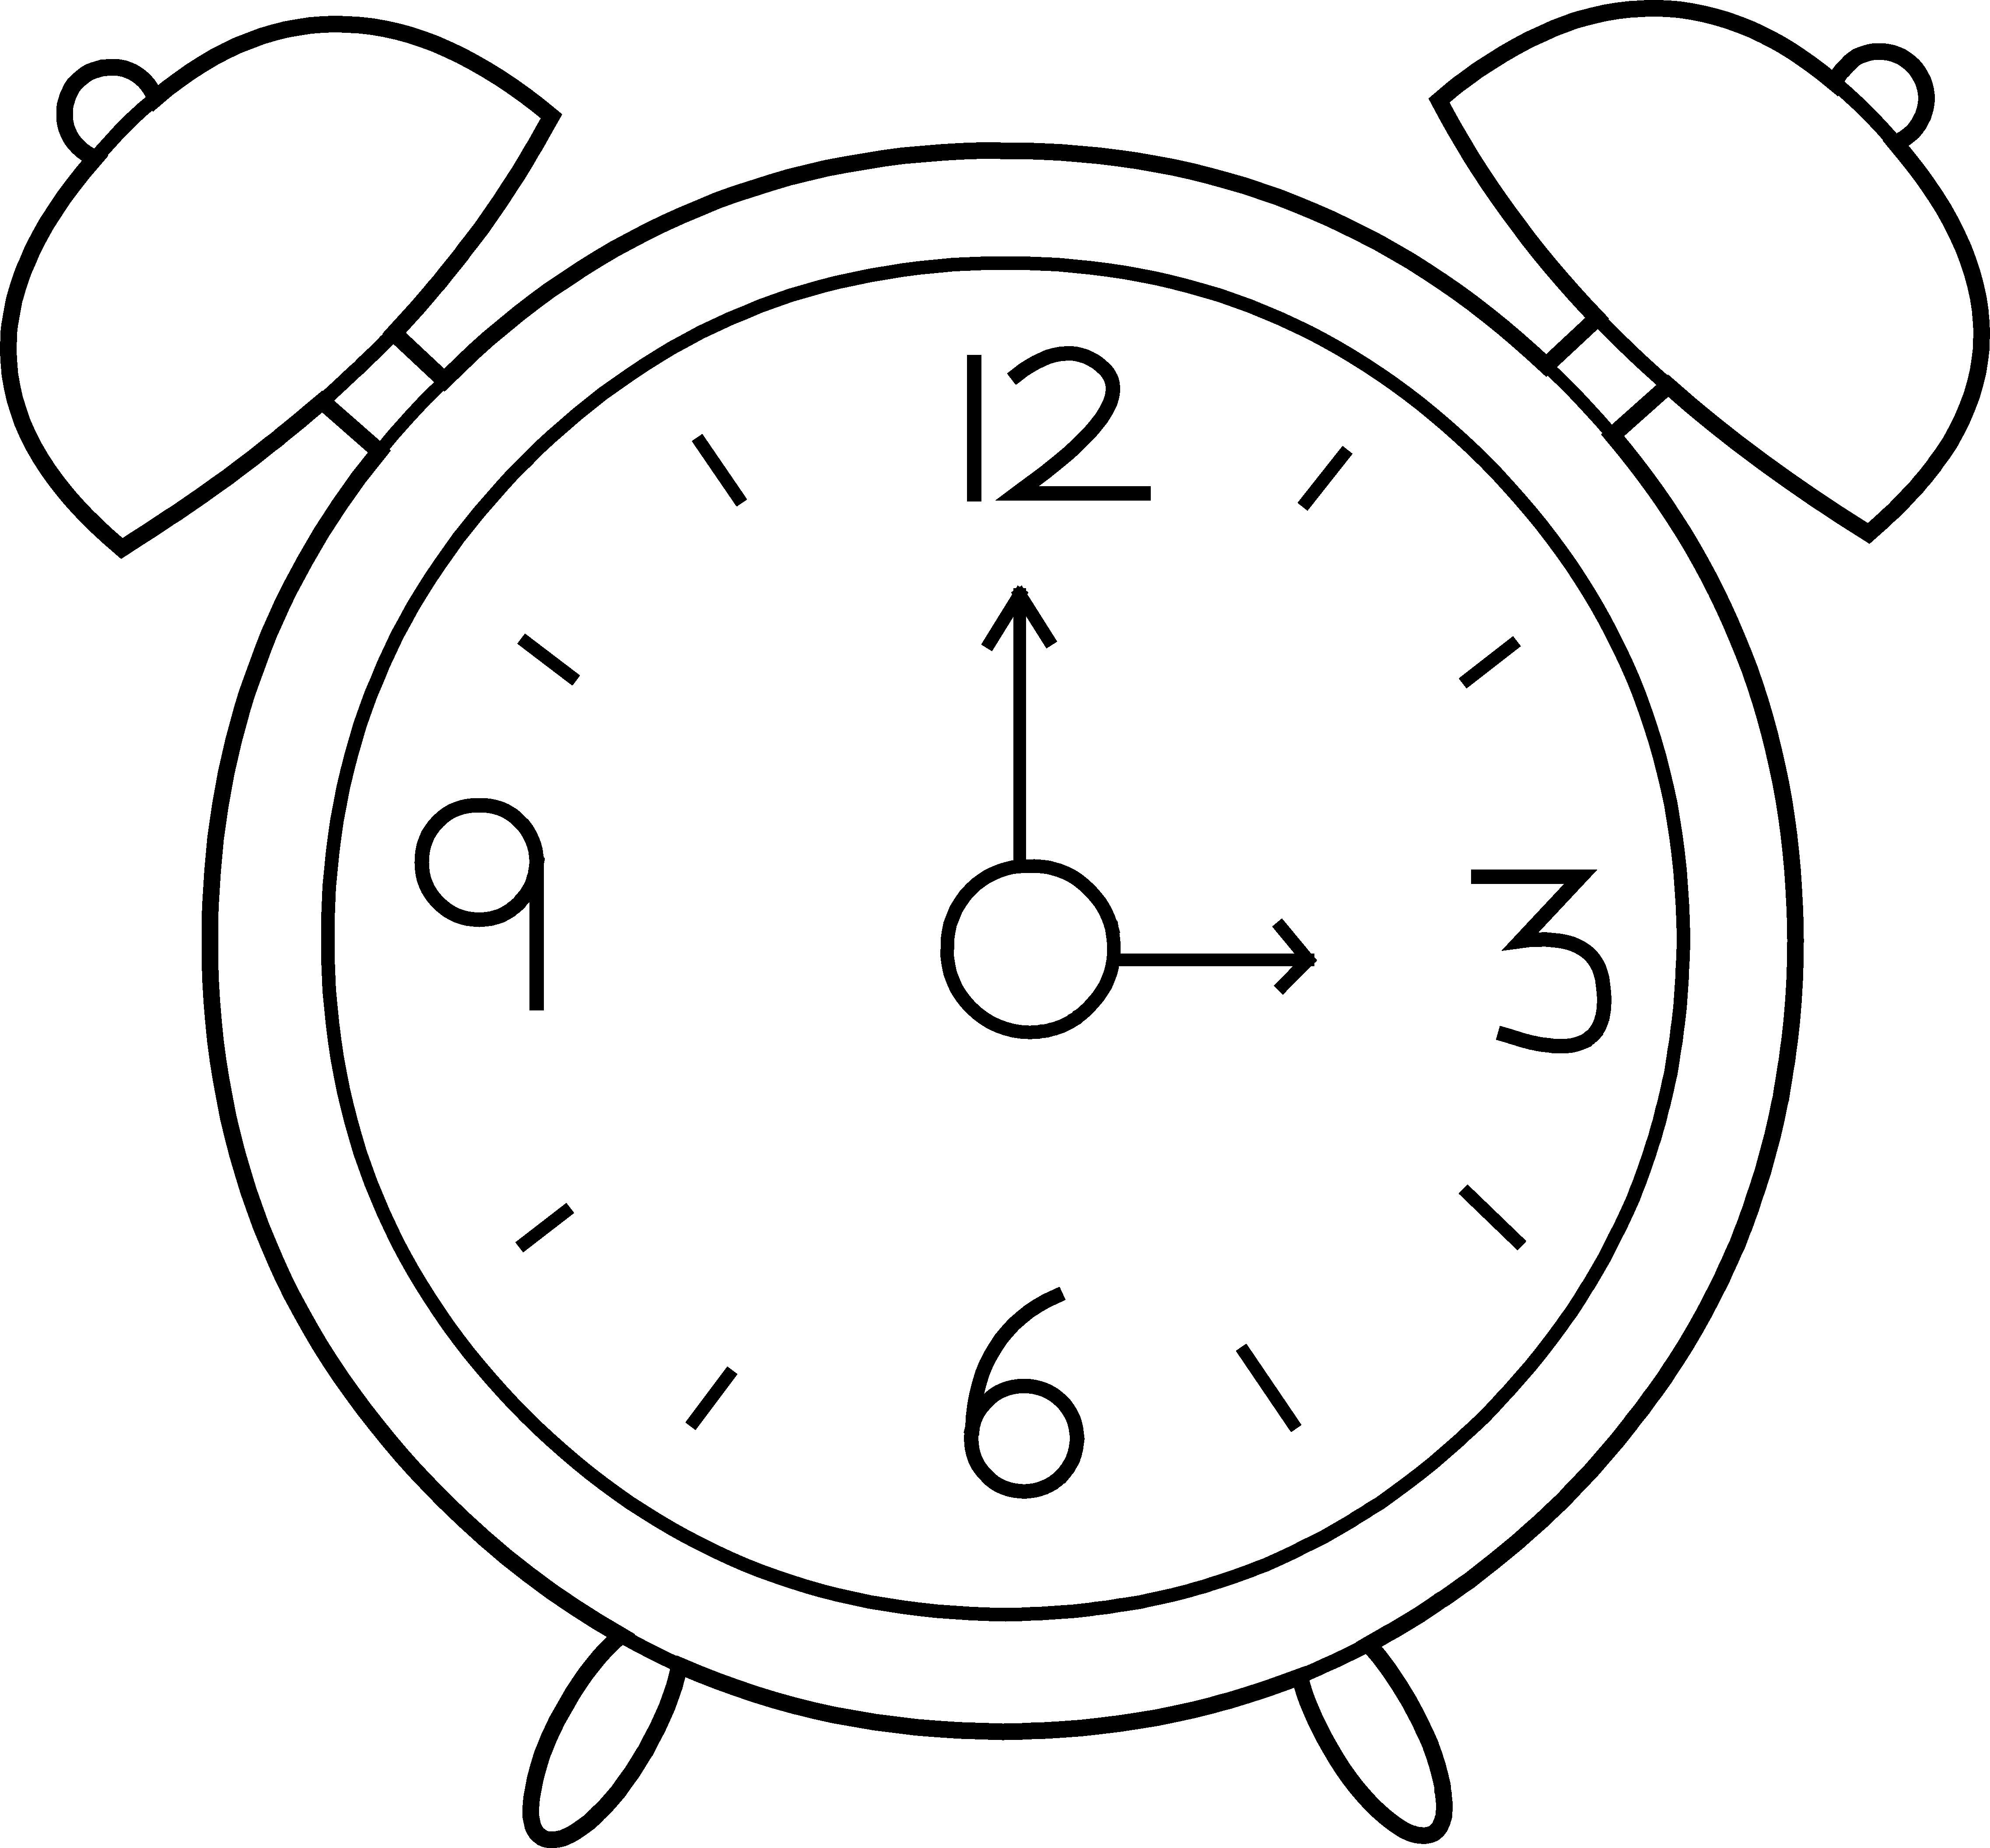 4548x4223 Clock Coloring Page Unique Alarm Line Art Free Clip Resume Also